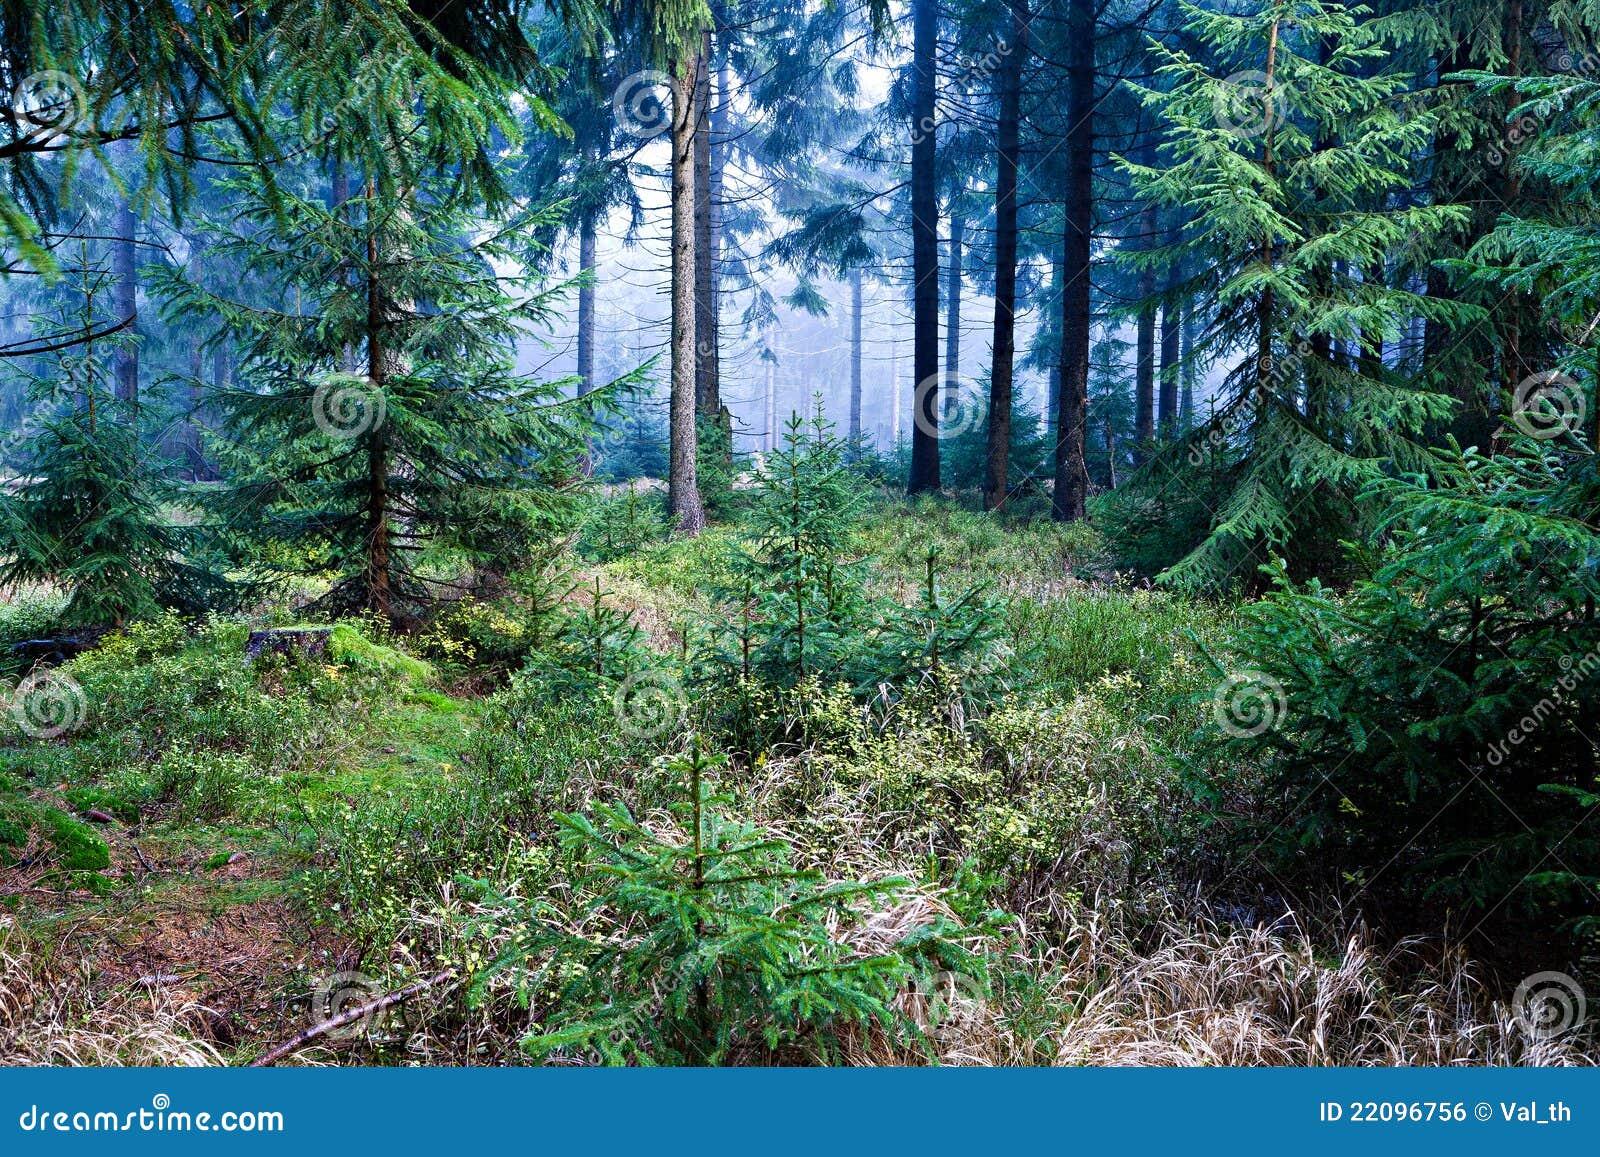 Foresta sempreverde immagine stock libera da diritti for Quercia sempreverde